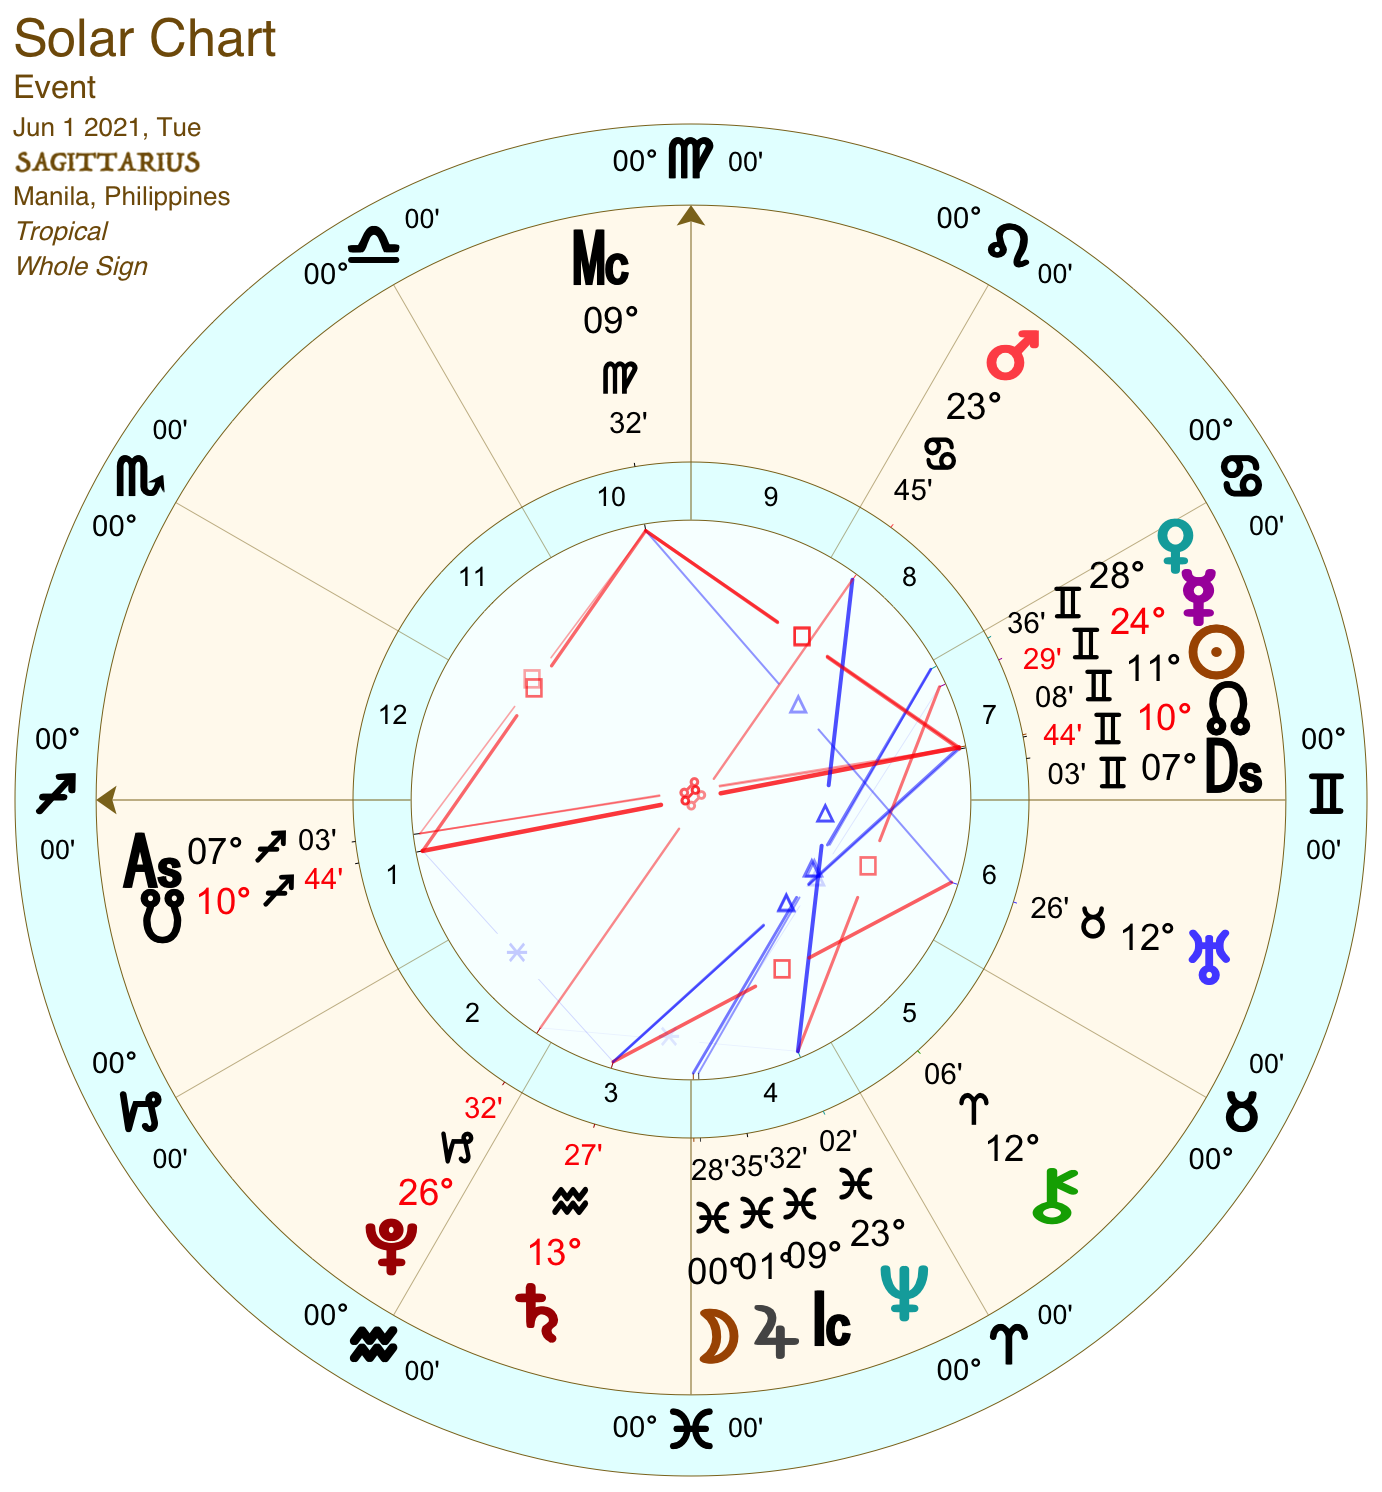 2021 06:Solar Chart:09 Sagittarius